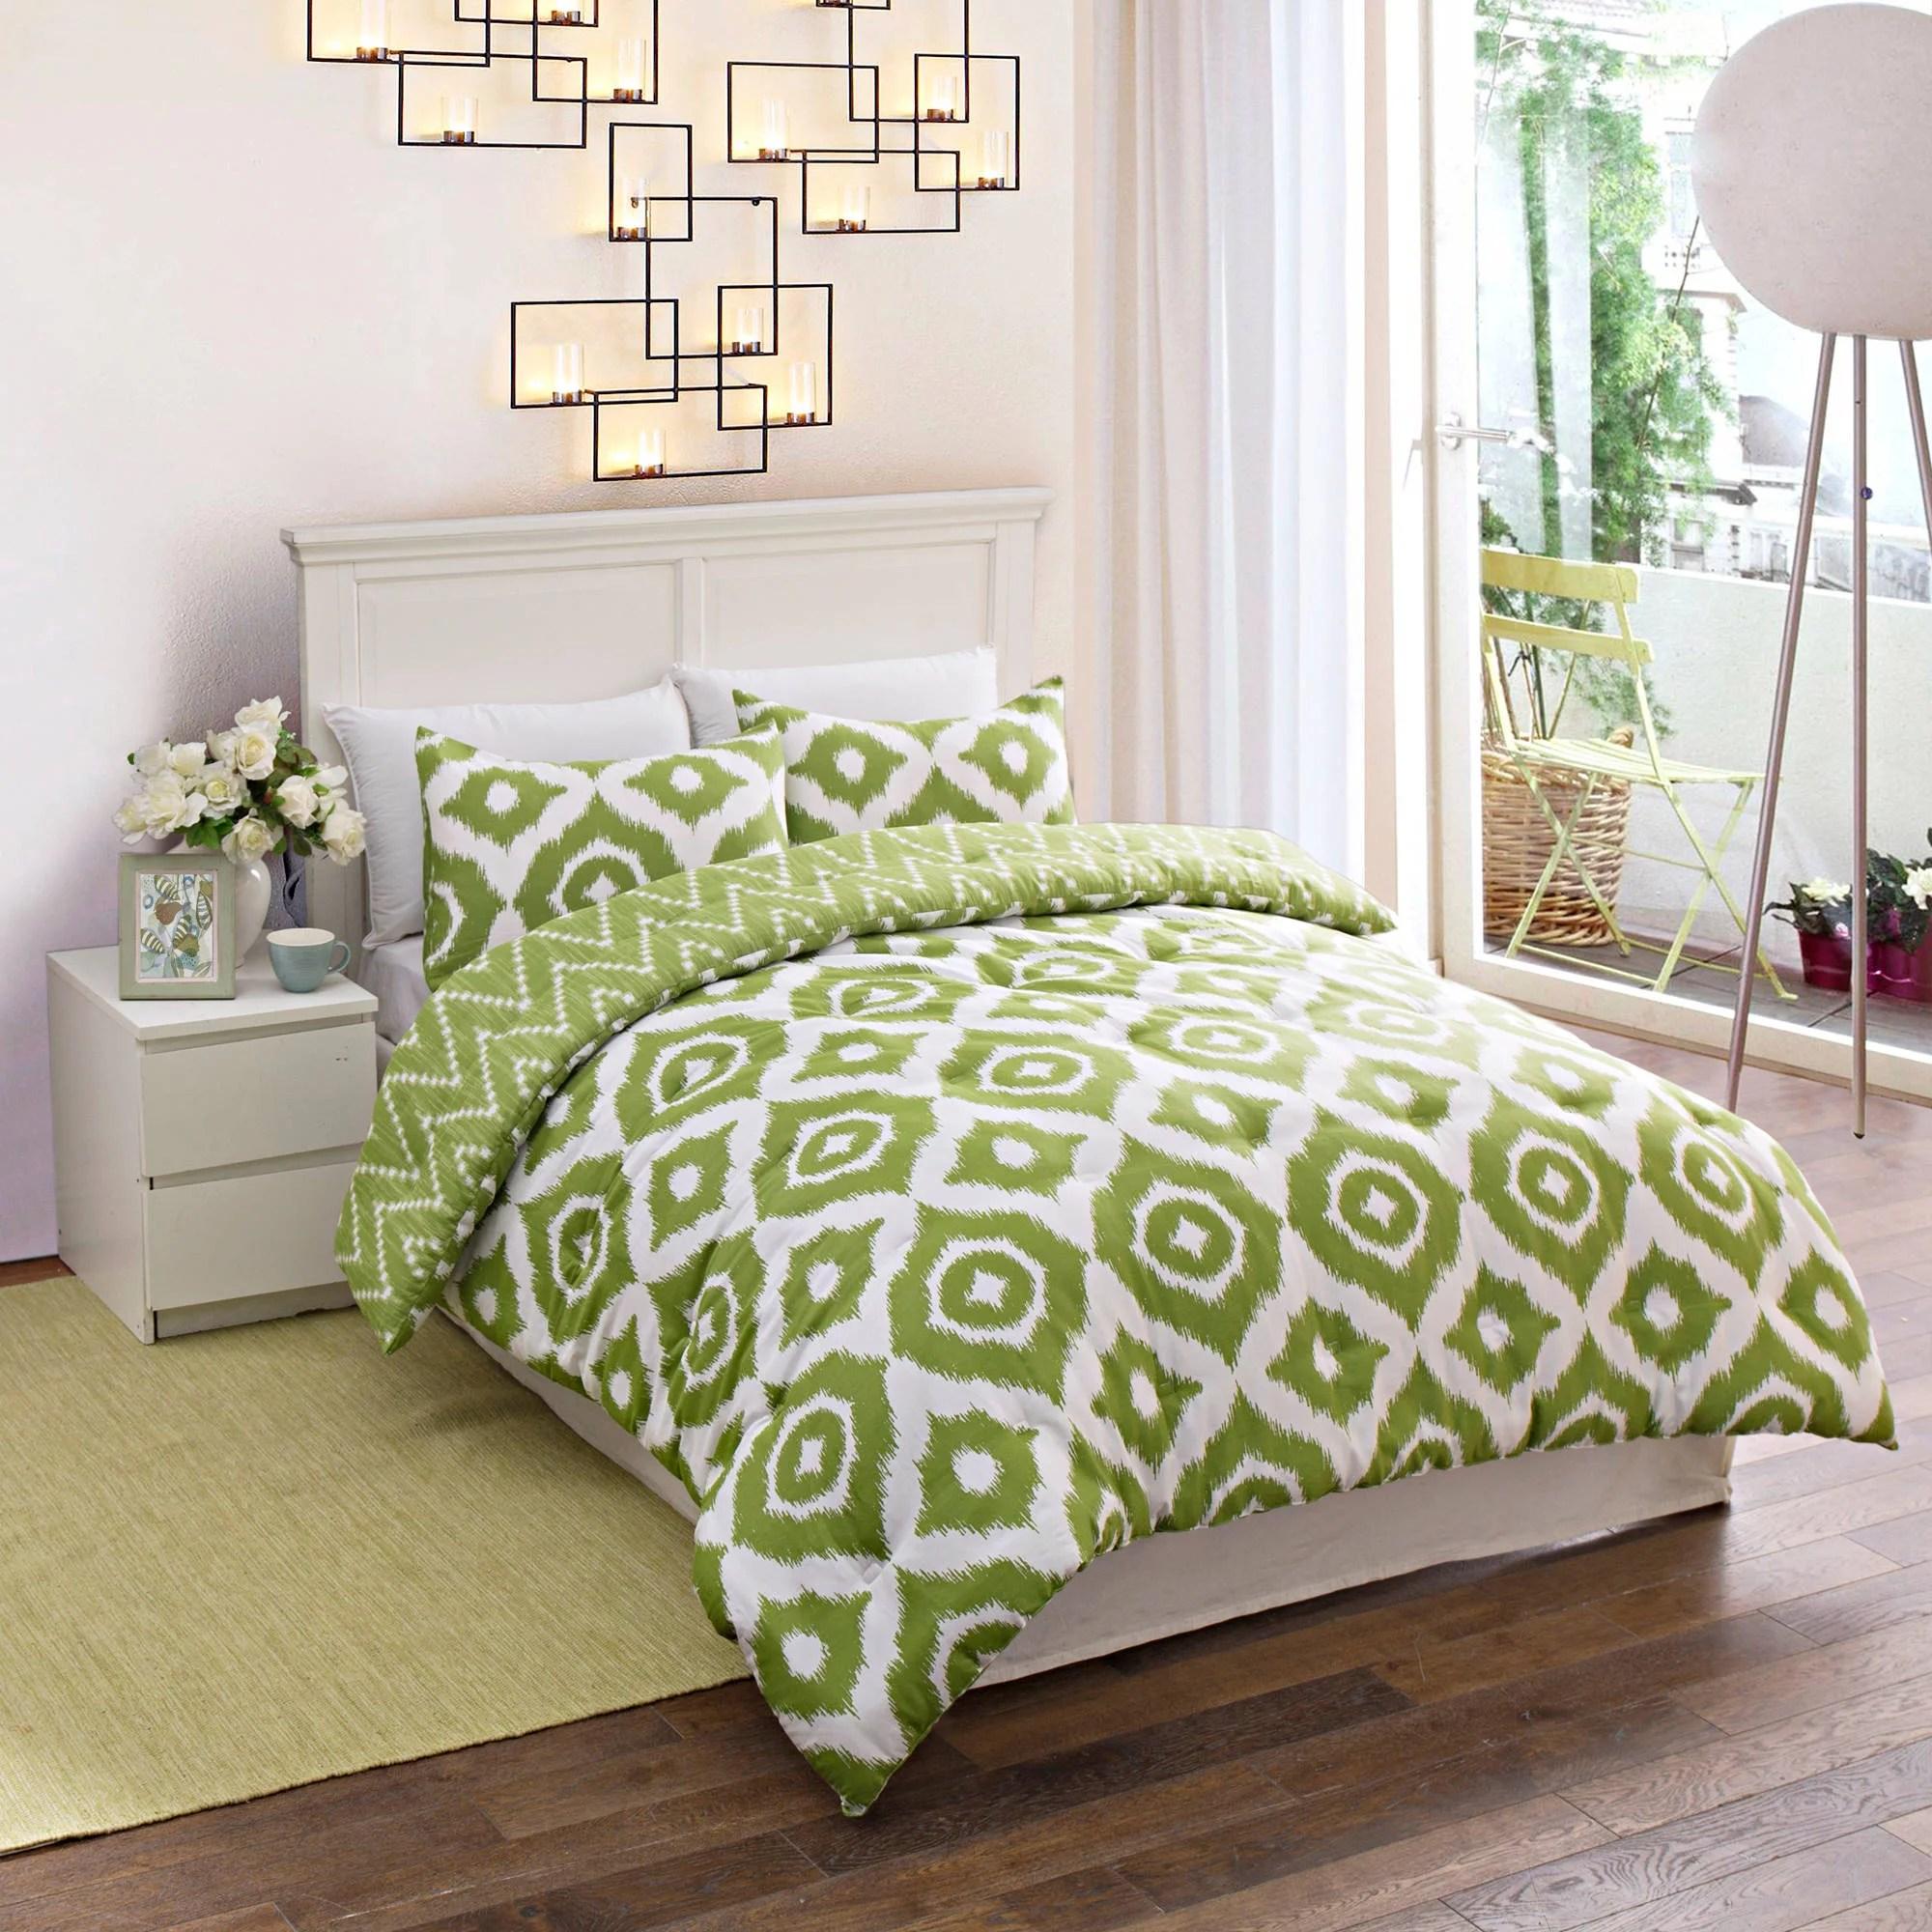 Geo Medallion Bedding Comforter Set